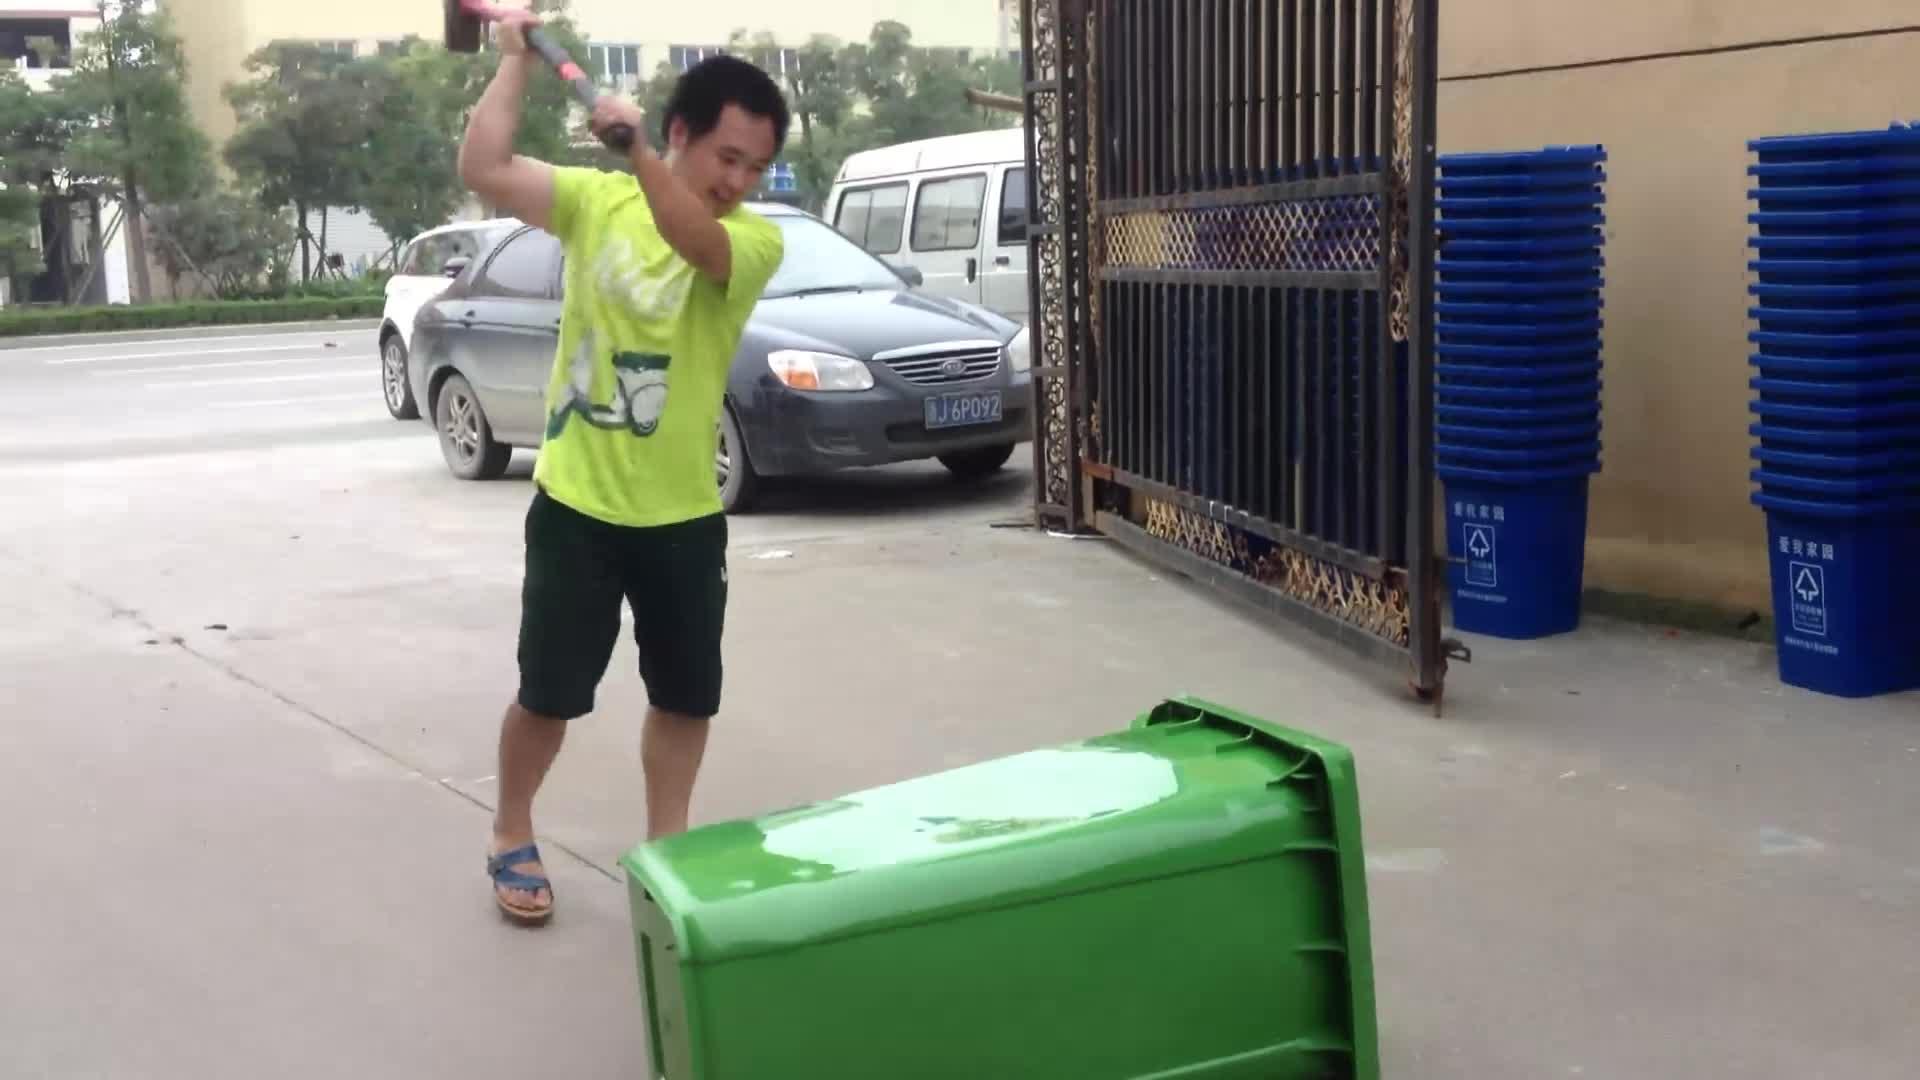 GT-240H 2-wheeled plastic waste bins